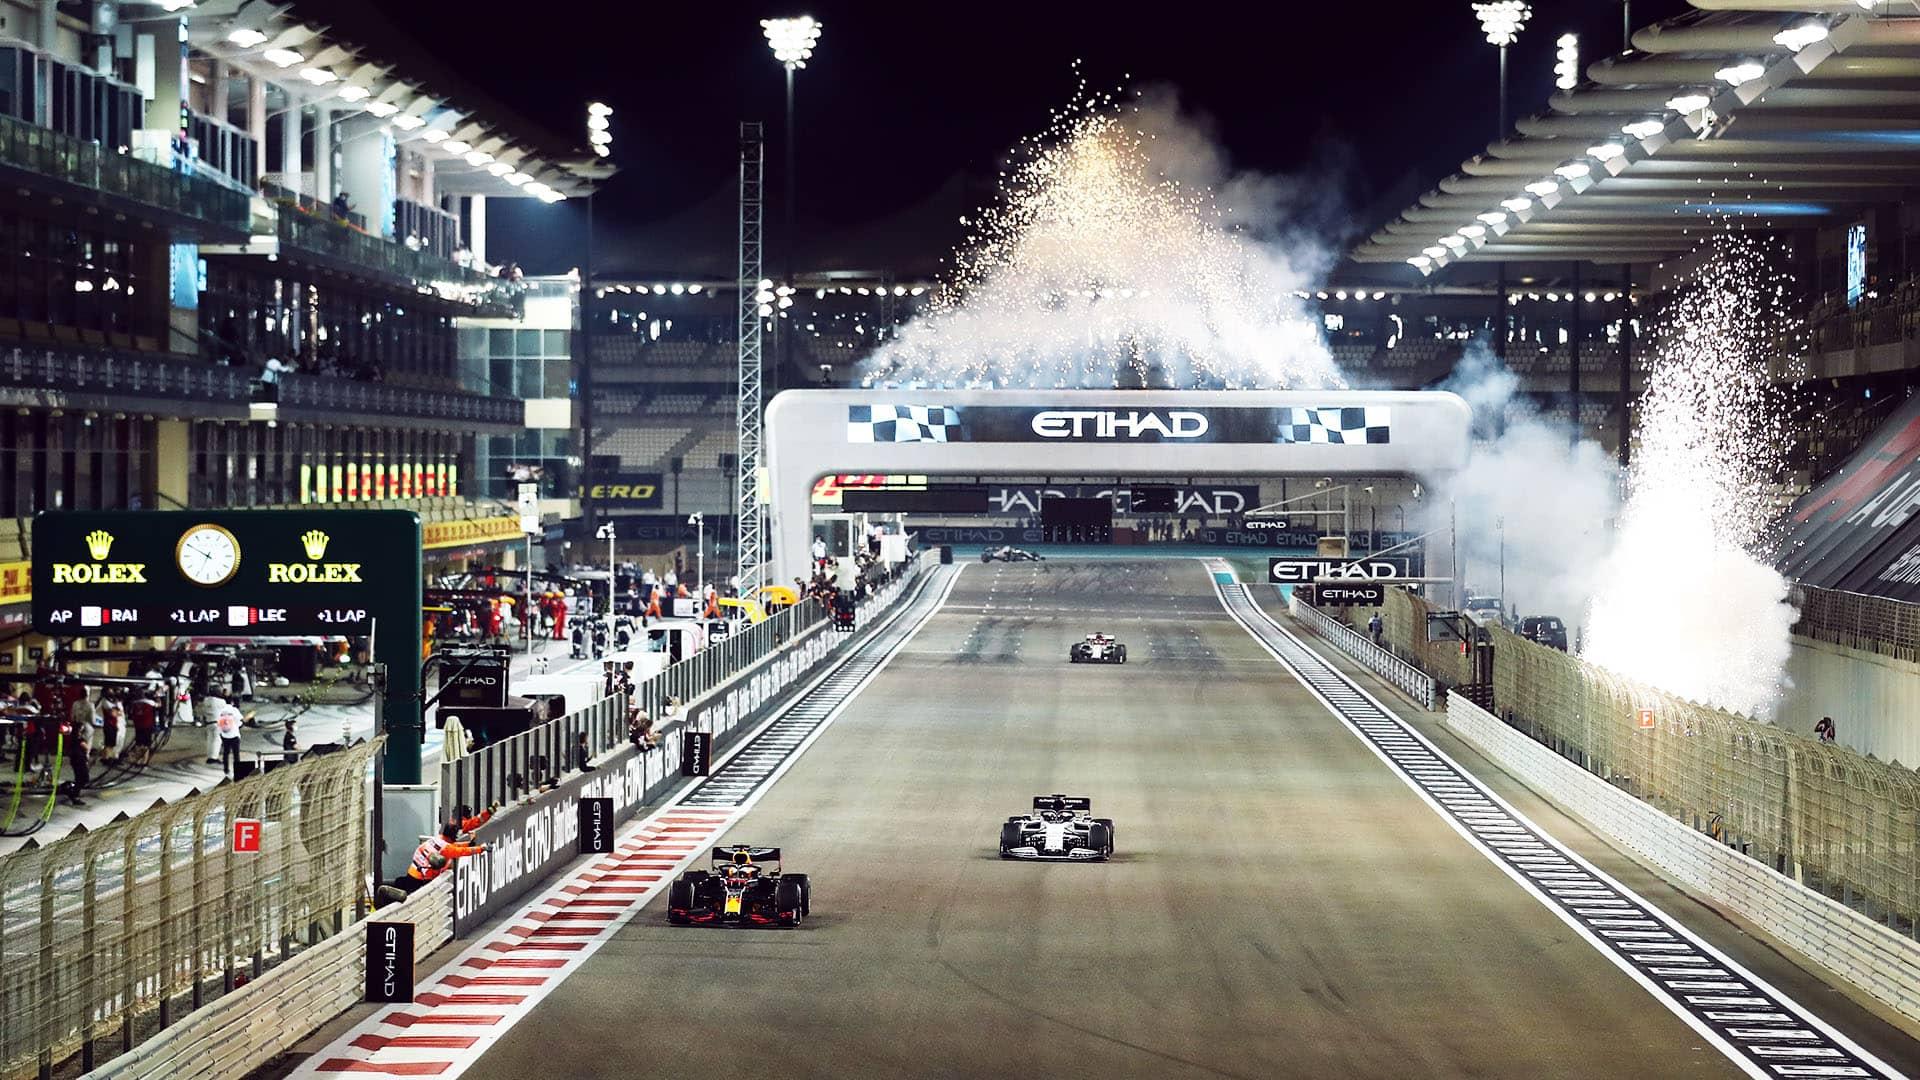 Abu Dhabi Grand Prix 2019 - F1 Race